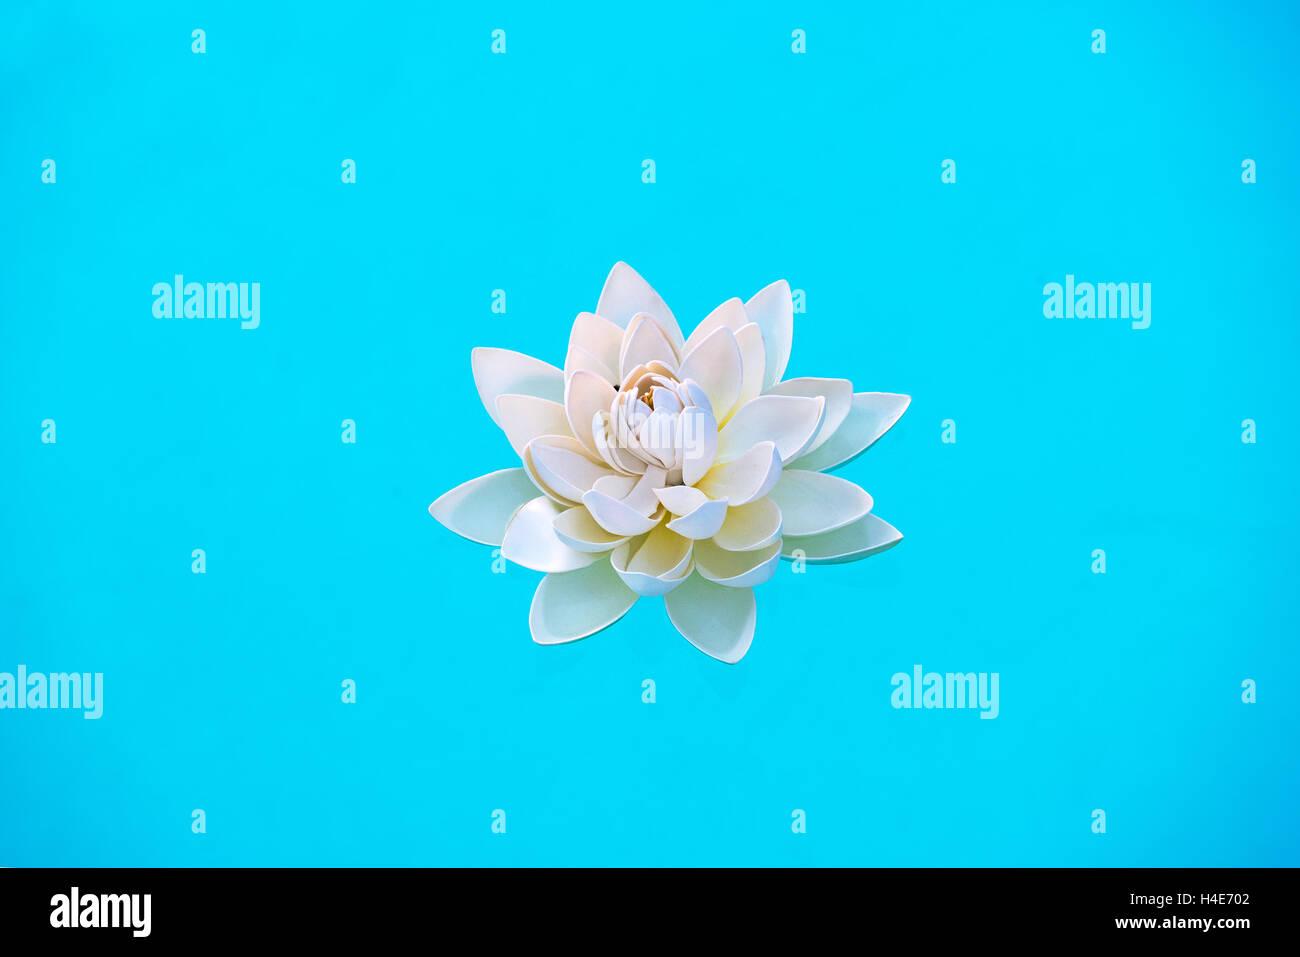 Solo nenúfar blanco, Nymphaea, flotando en el agua azul claro fresco en un concepto de bienestar o un spa Imagen De Stock